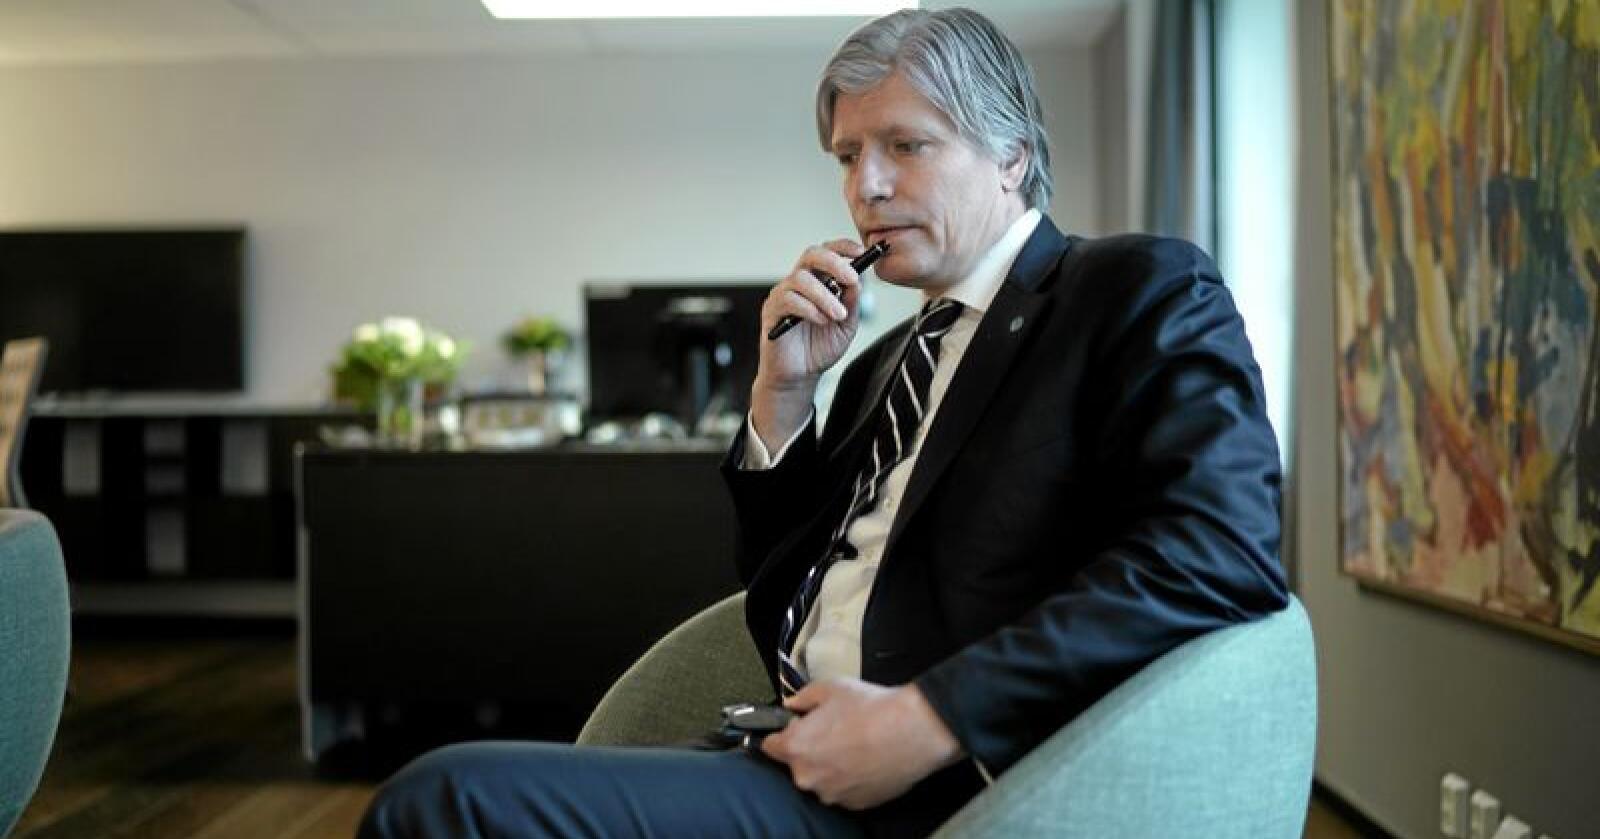 Klima- og miljøminister Ola Elvestuen. Foto: Ketil Blom Haugstulen